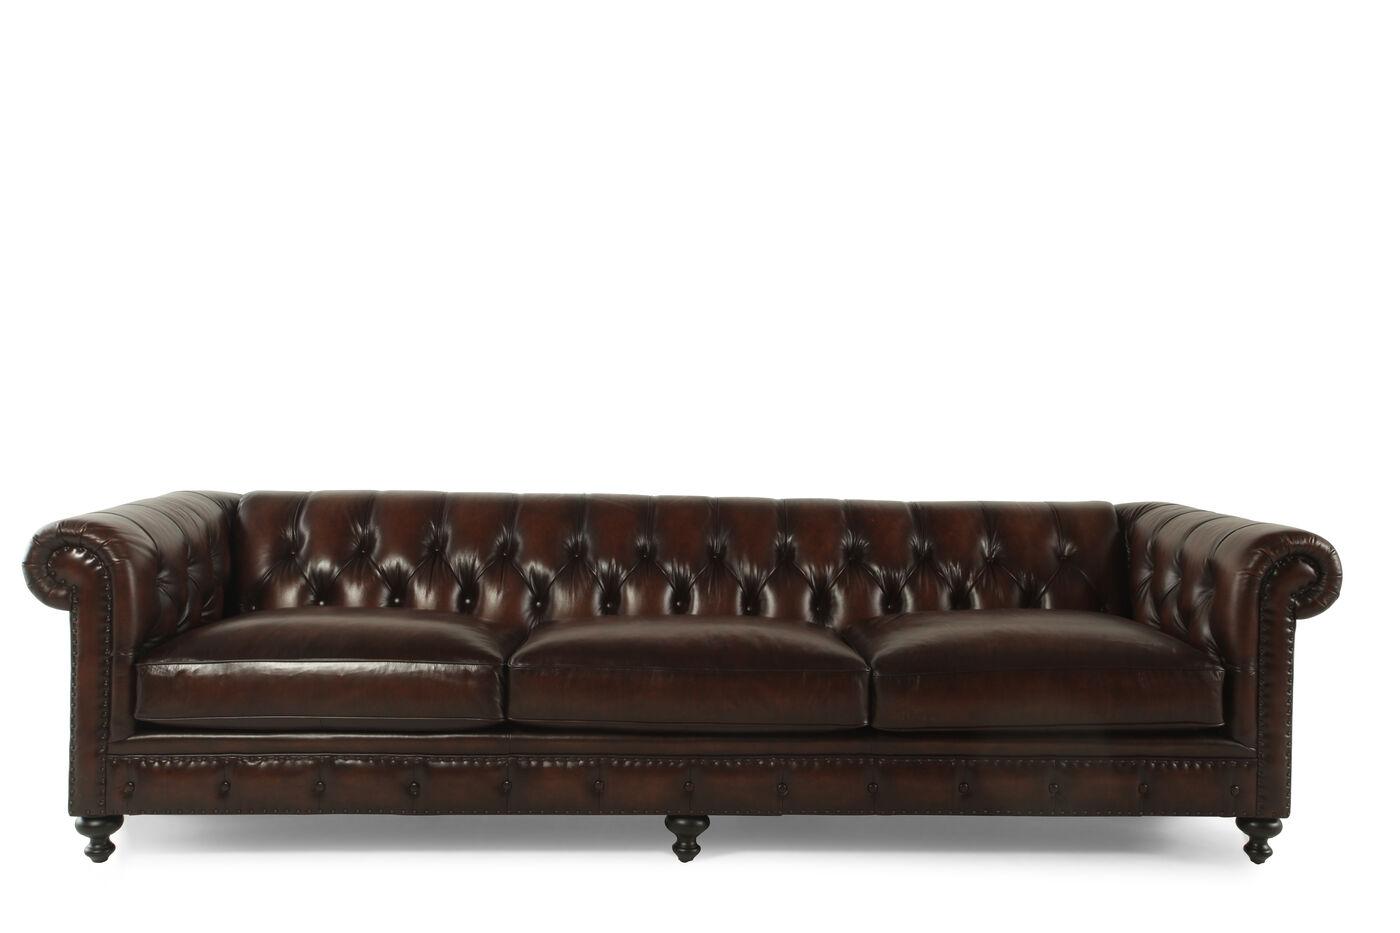 Mathis Brothers Bernhardt Leather Sofas Refil Sofa